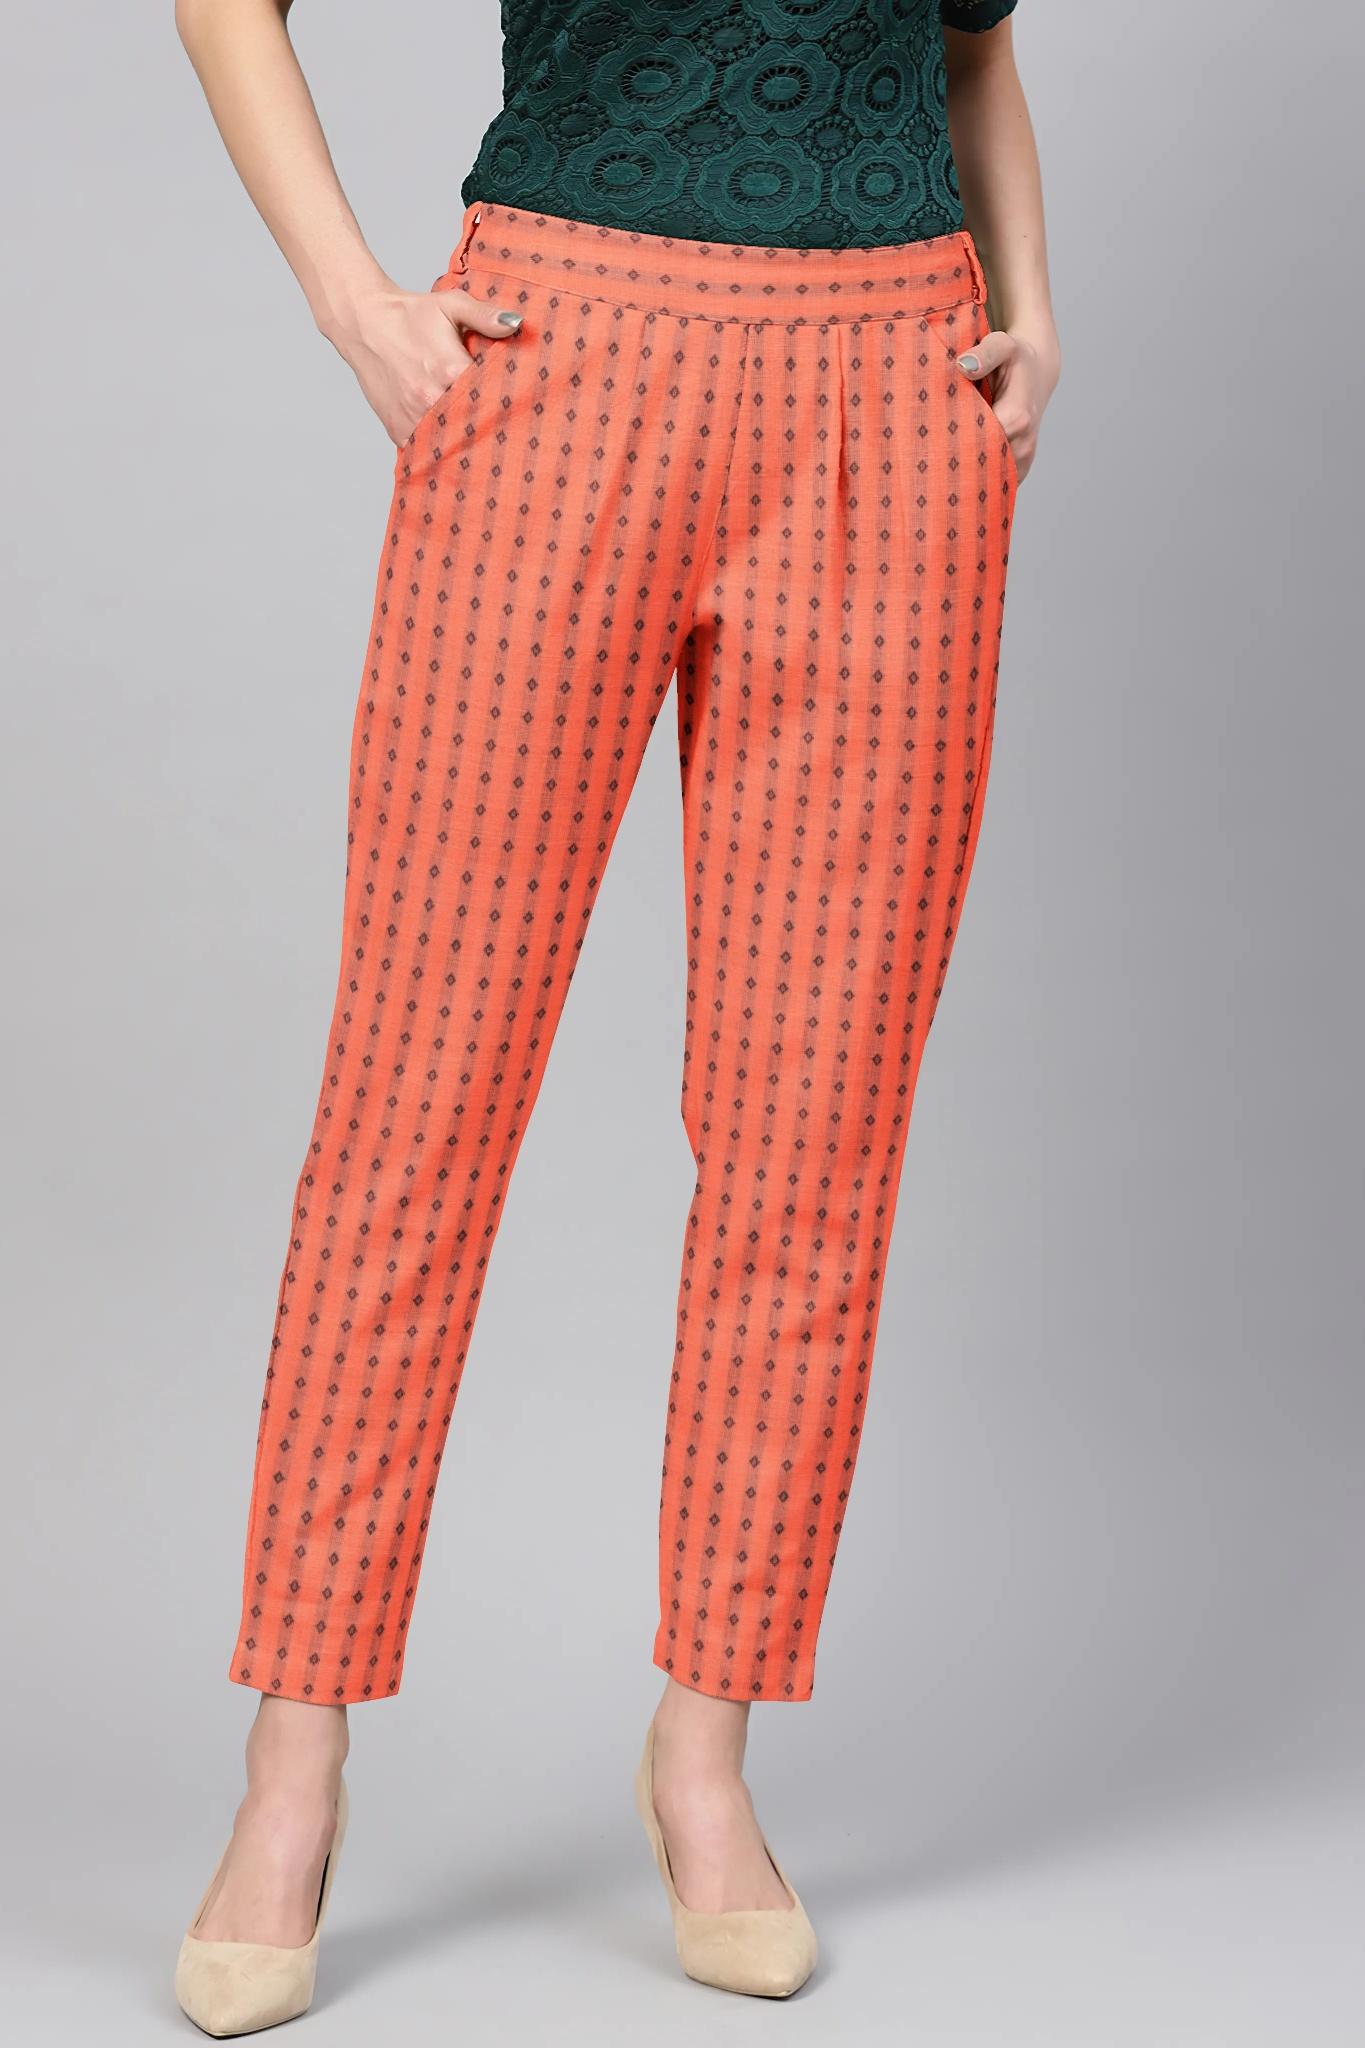 /home/customer/www/fabartcraft.com/public_html/uploadshttps://www.shopolics.com/uploads/images/medium/Peach-Black-Cotton-Polka-Regular-Fit-Solid-Trouser-36081.jpg